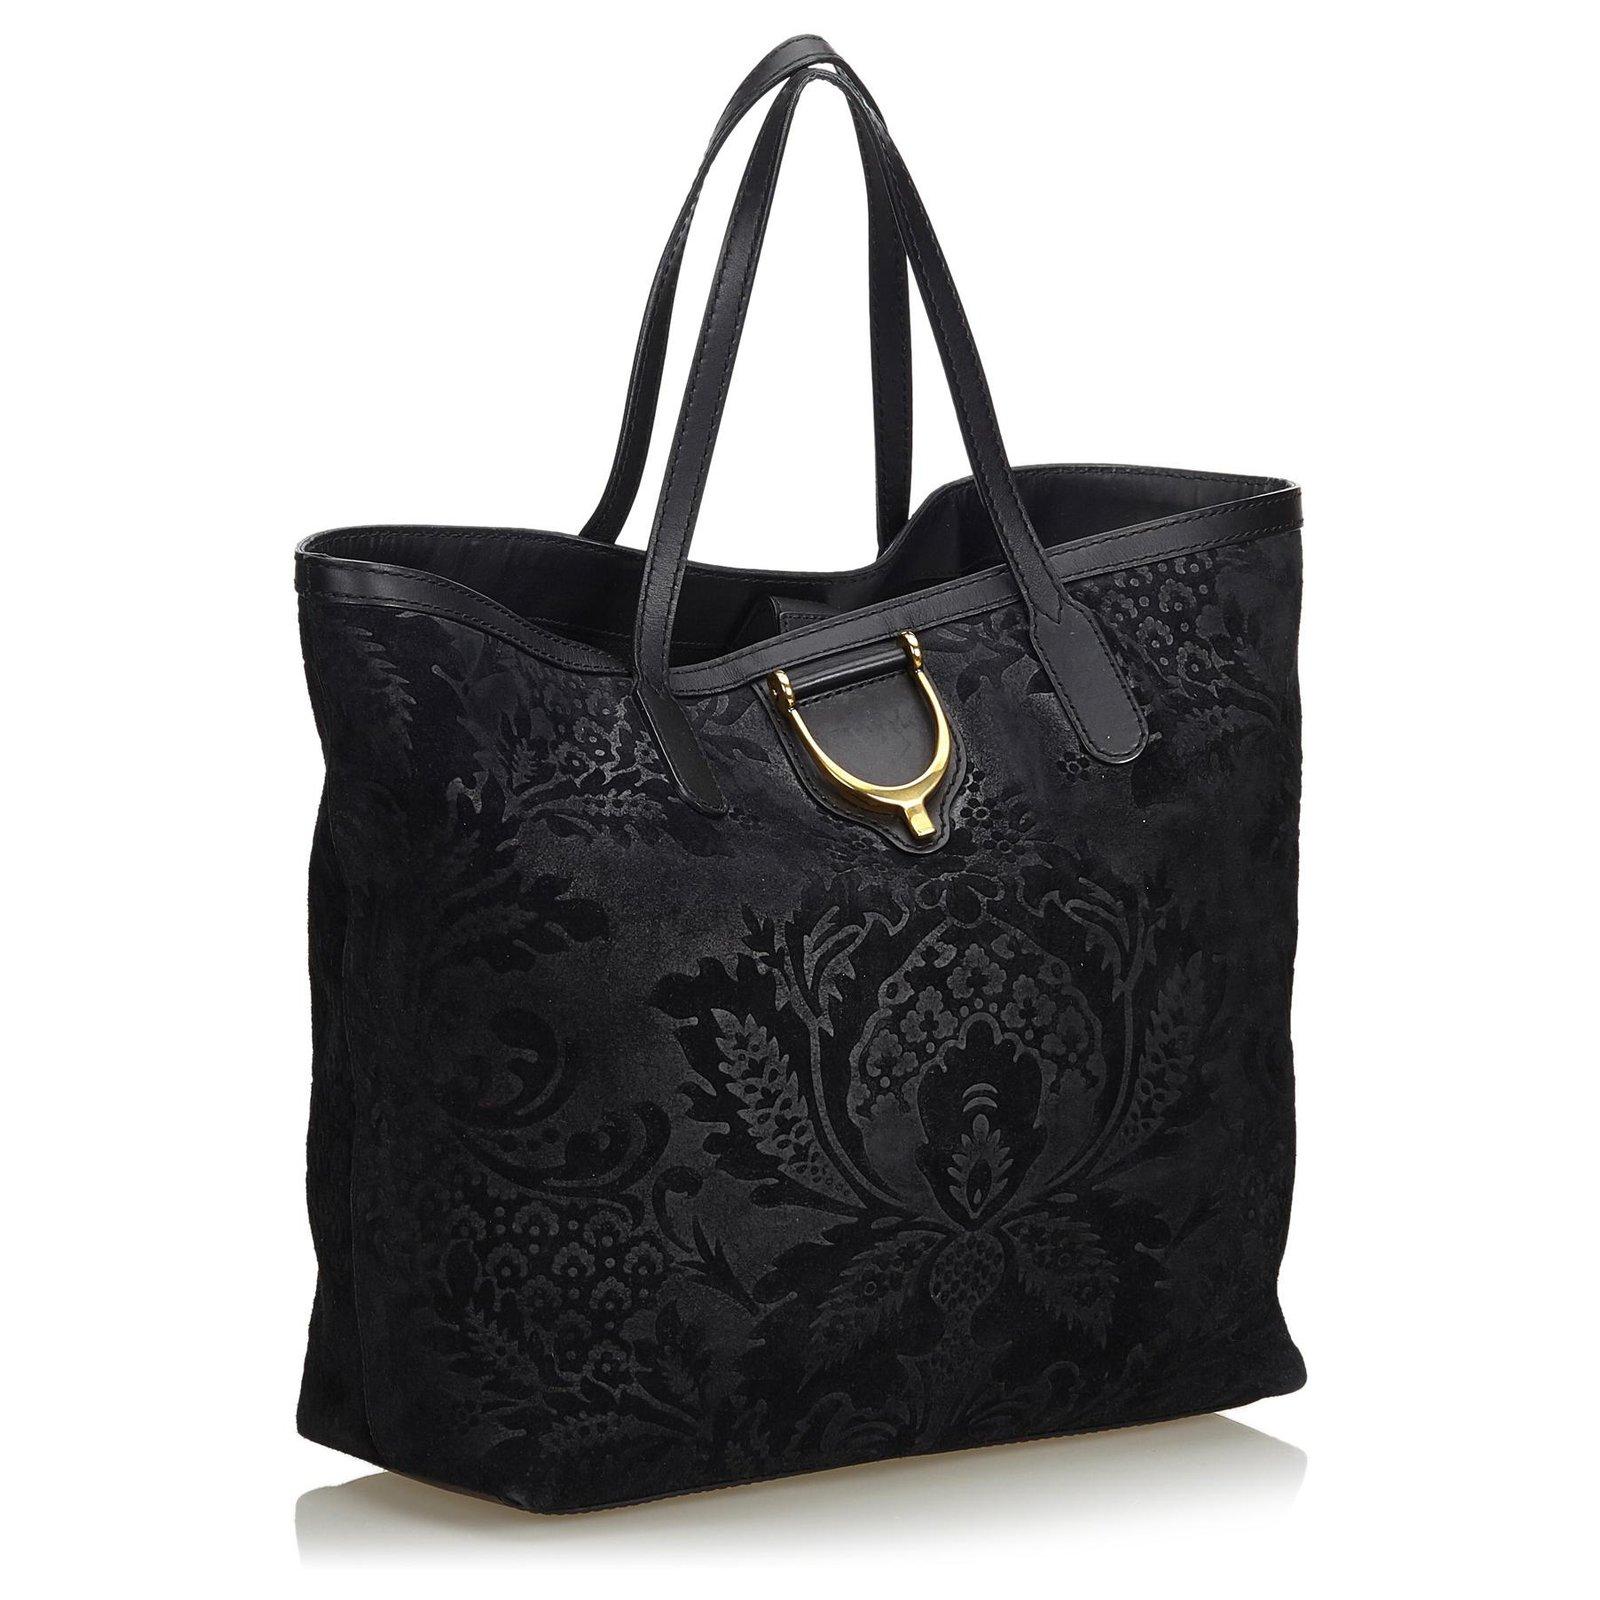 23a9920de Gucci Gucci Black Suede Brocade Stirrup Tote Bag Totes Suede,Leather Black  ref.122883 - Joli Closet